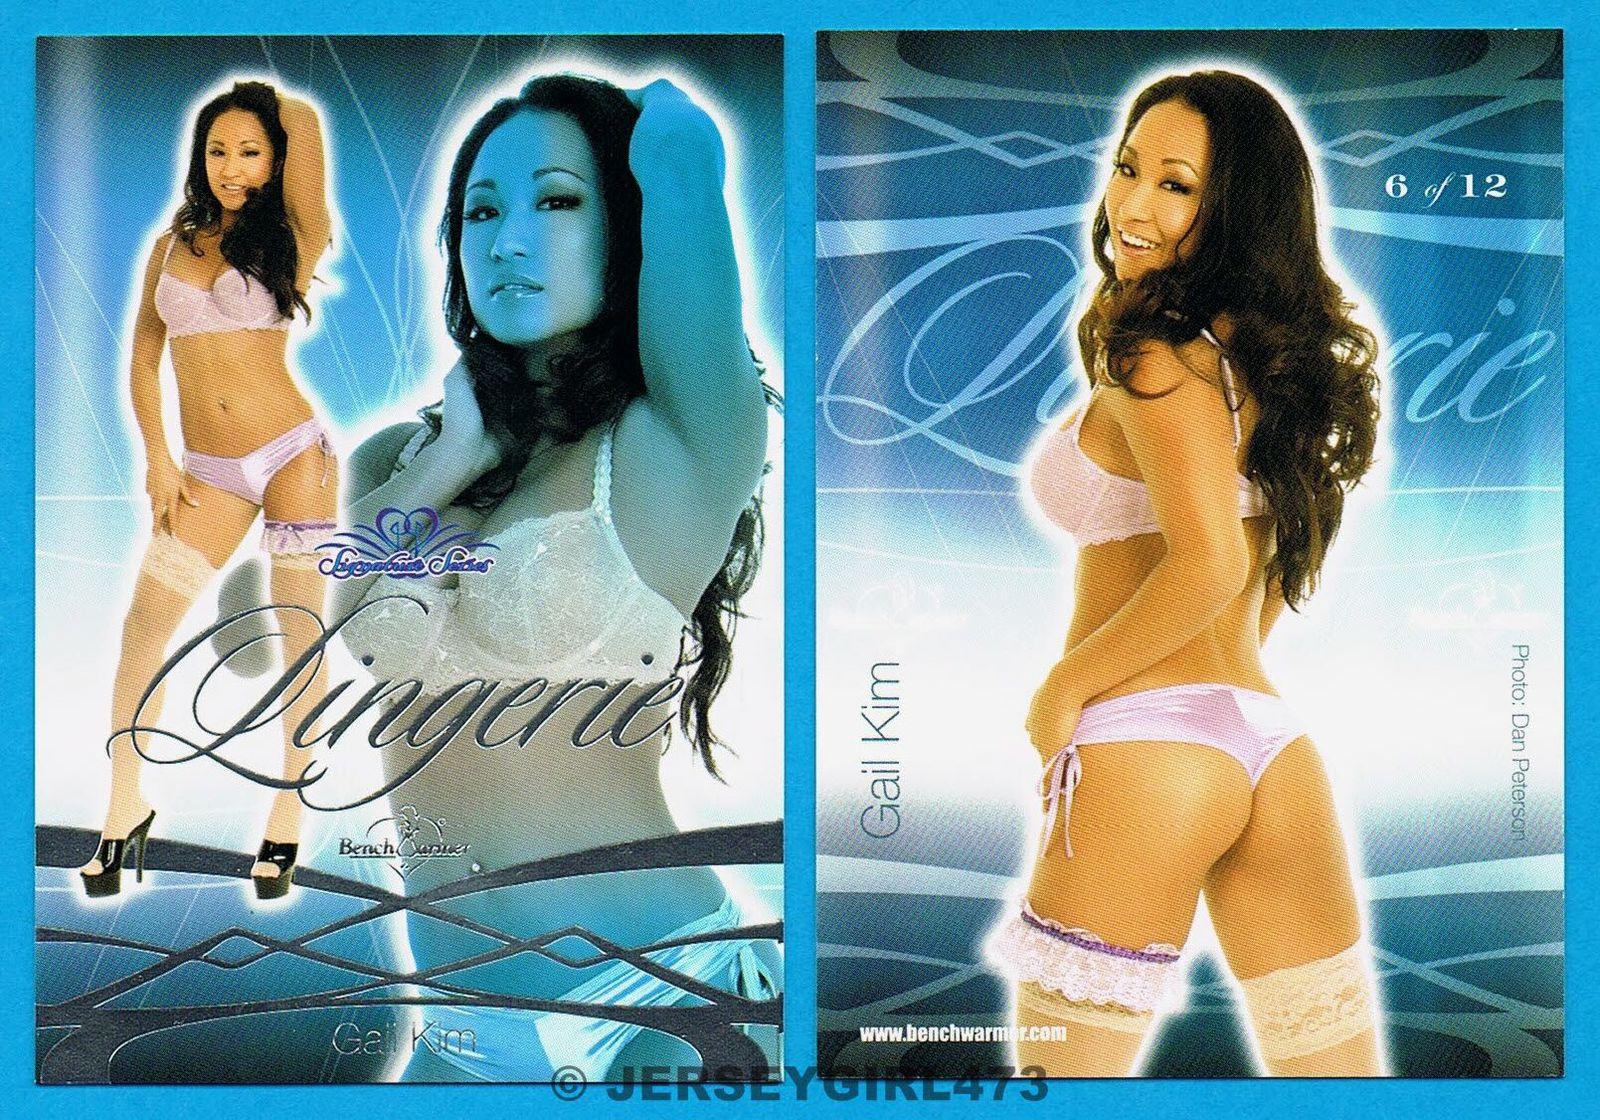 Gail Kim 2008 Bench Warmer Signature Series Lingerie Card #6 ~ WWE DIVA